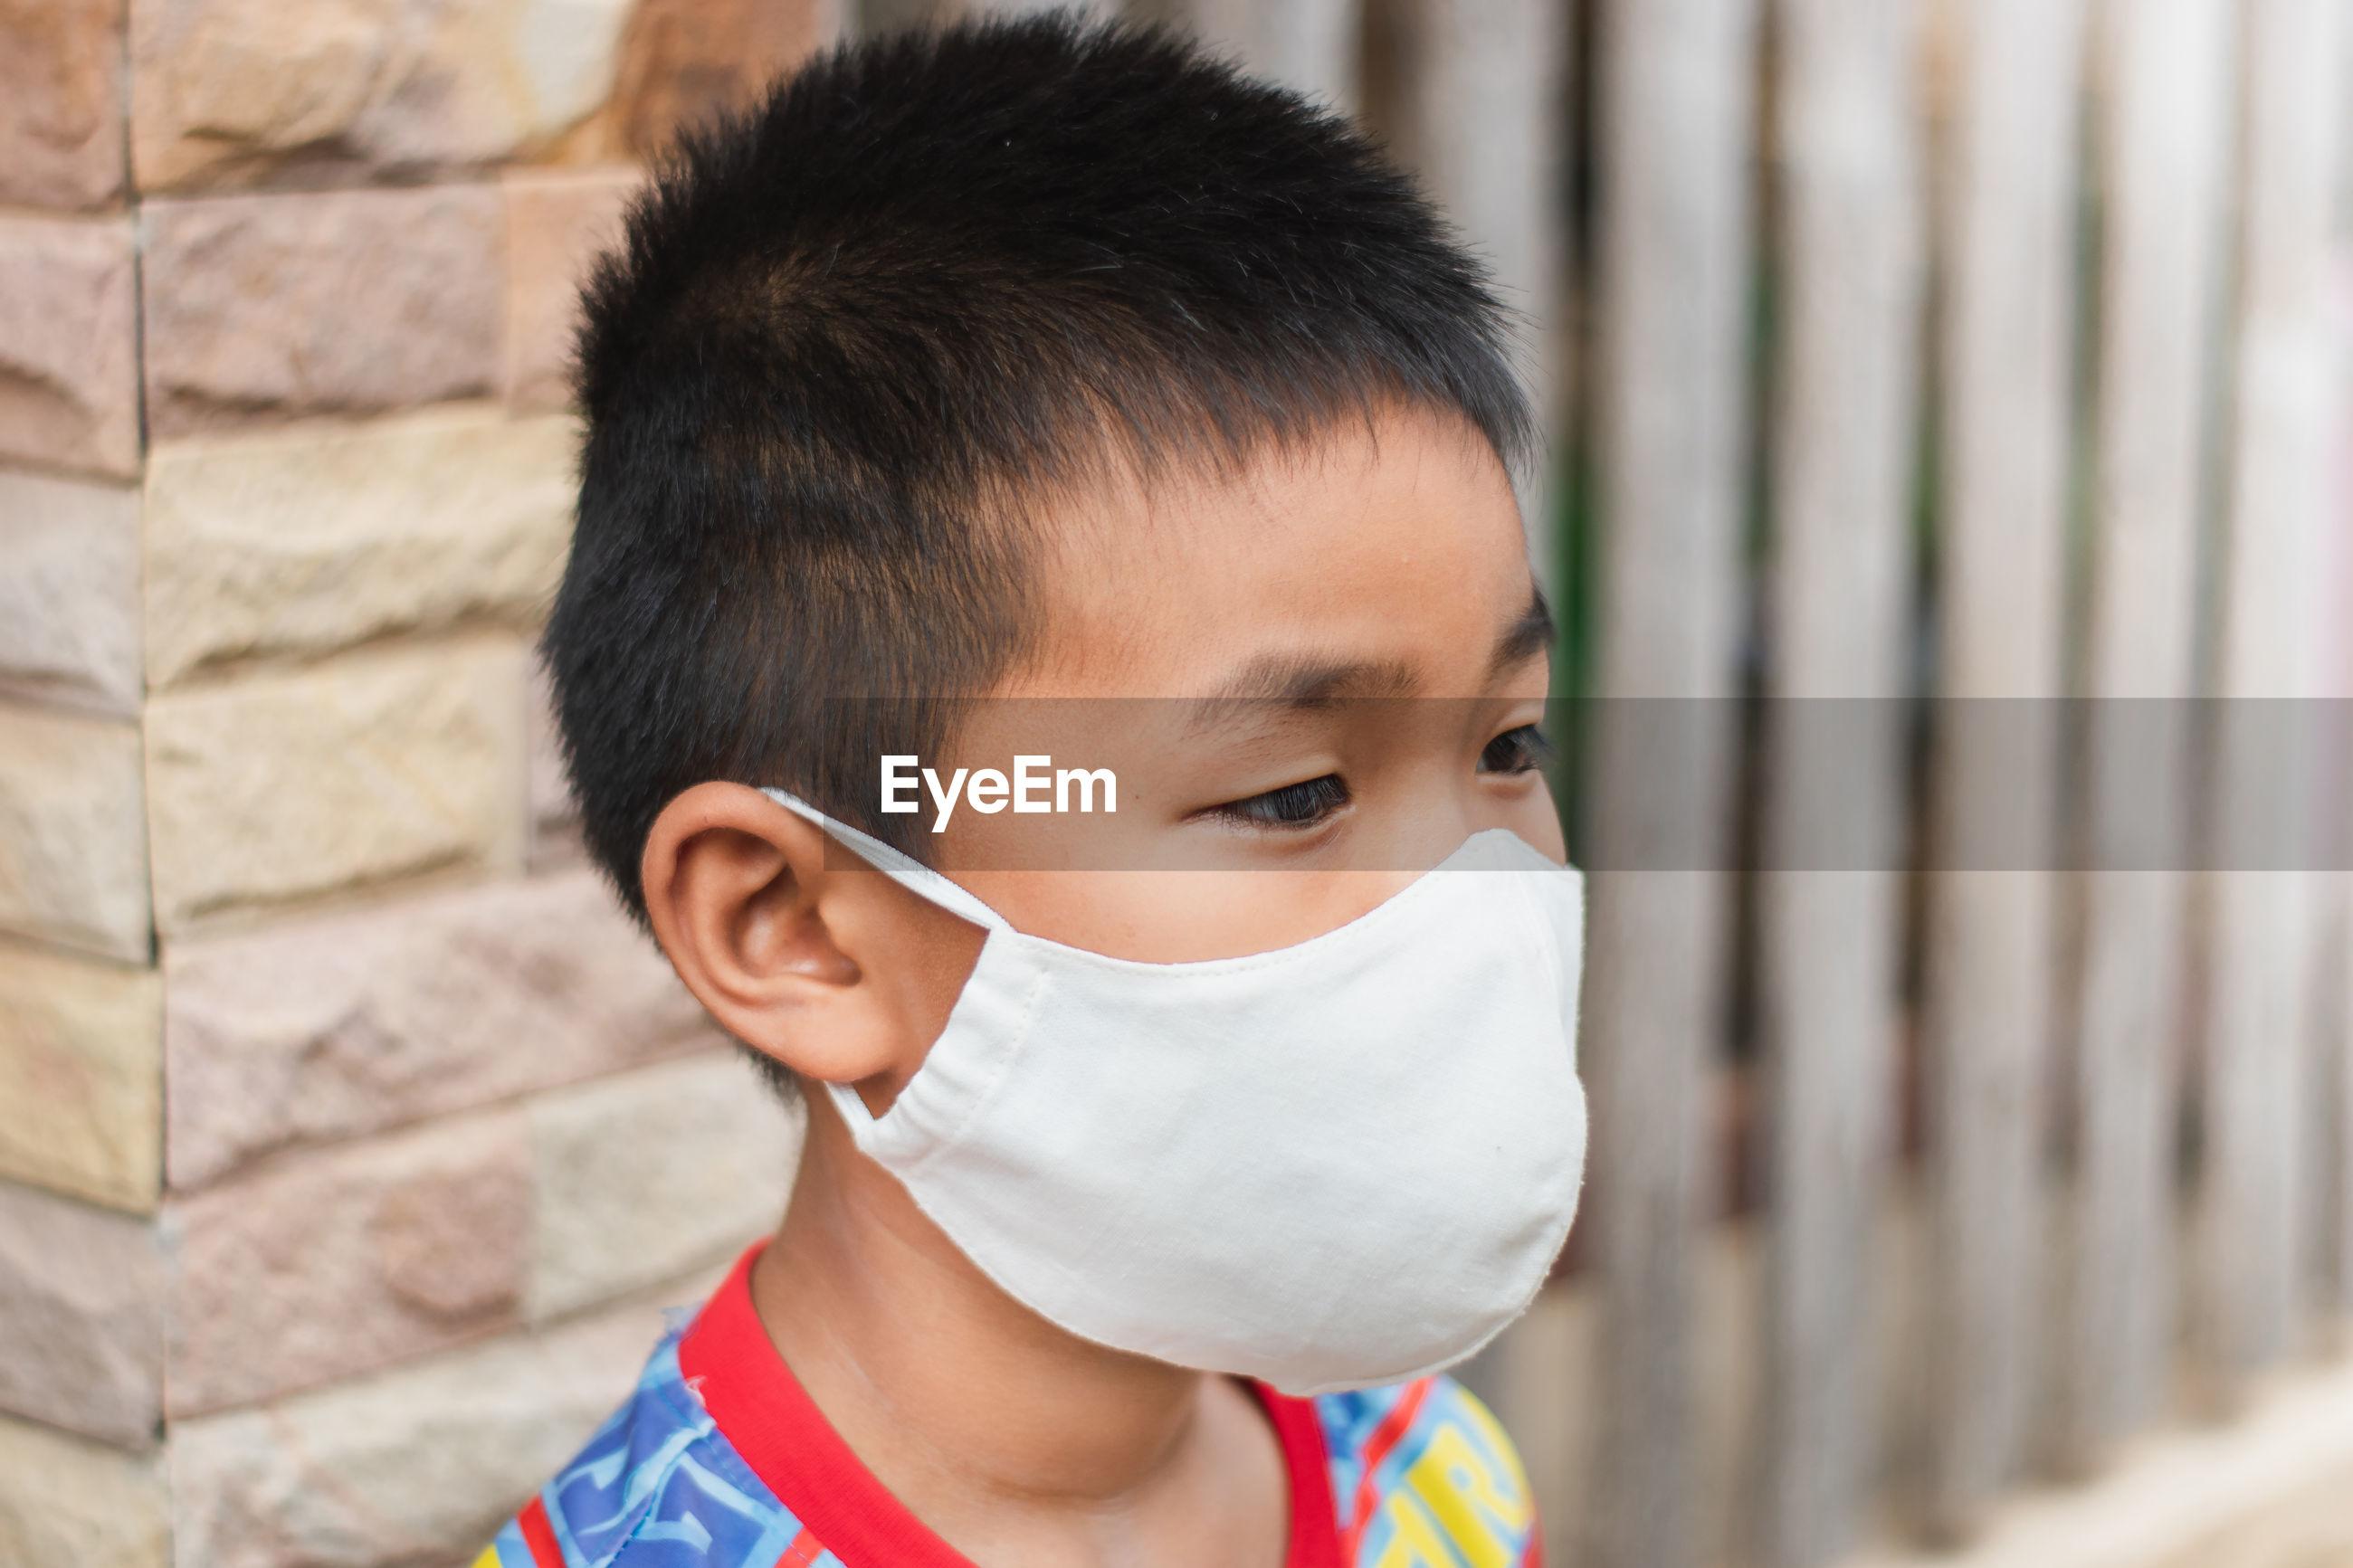 Close-up of boy wearing mask